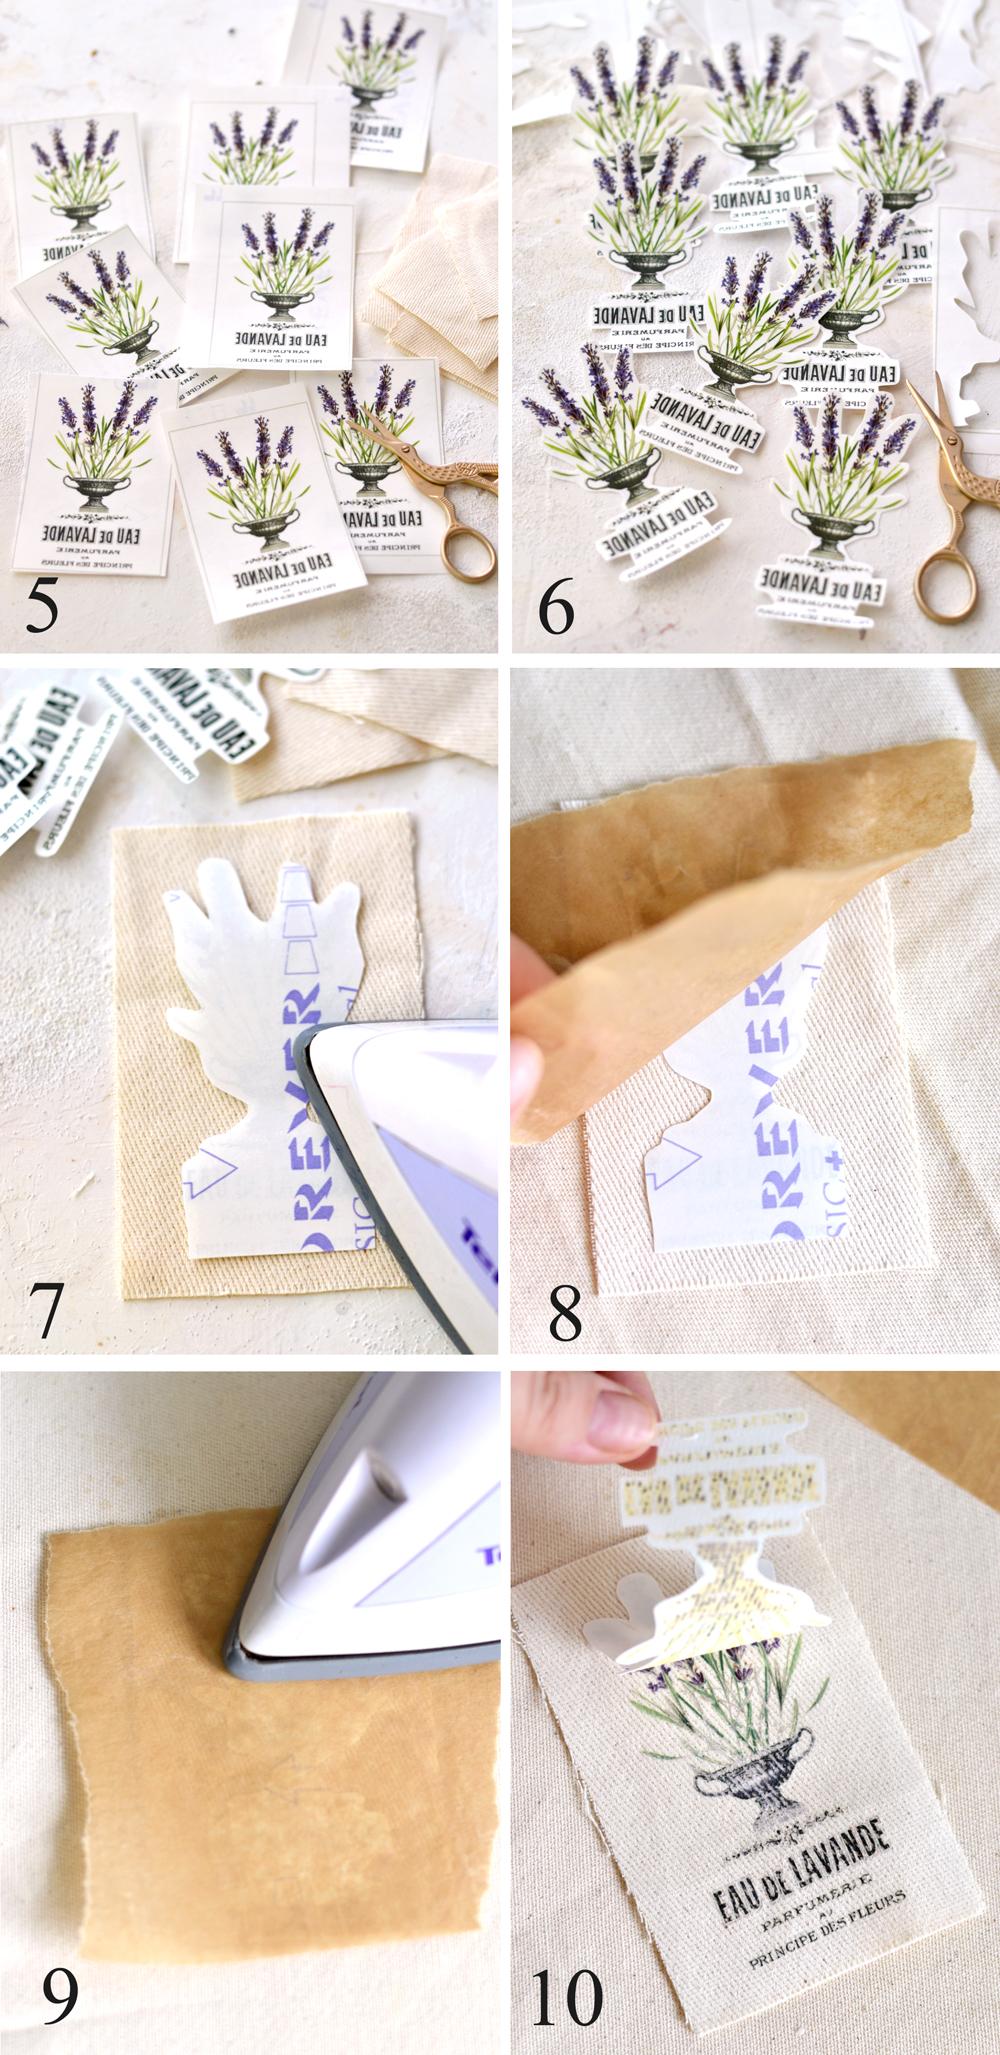 Next steps no sew sachets